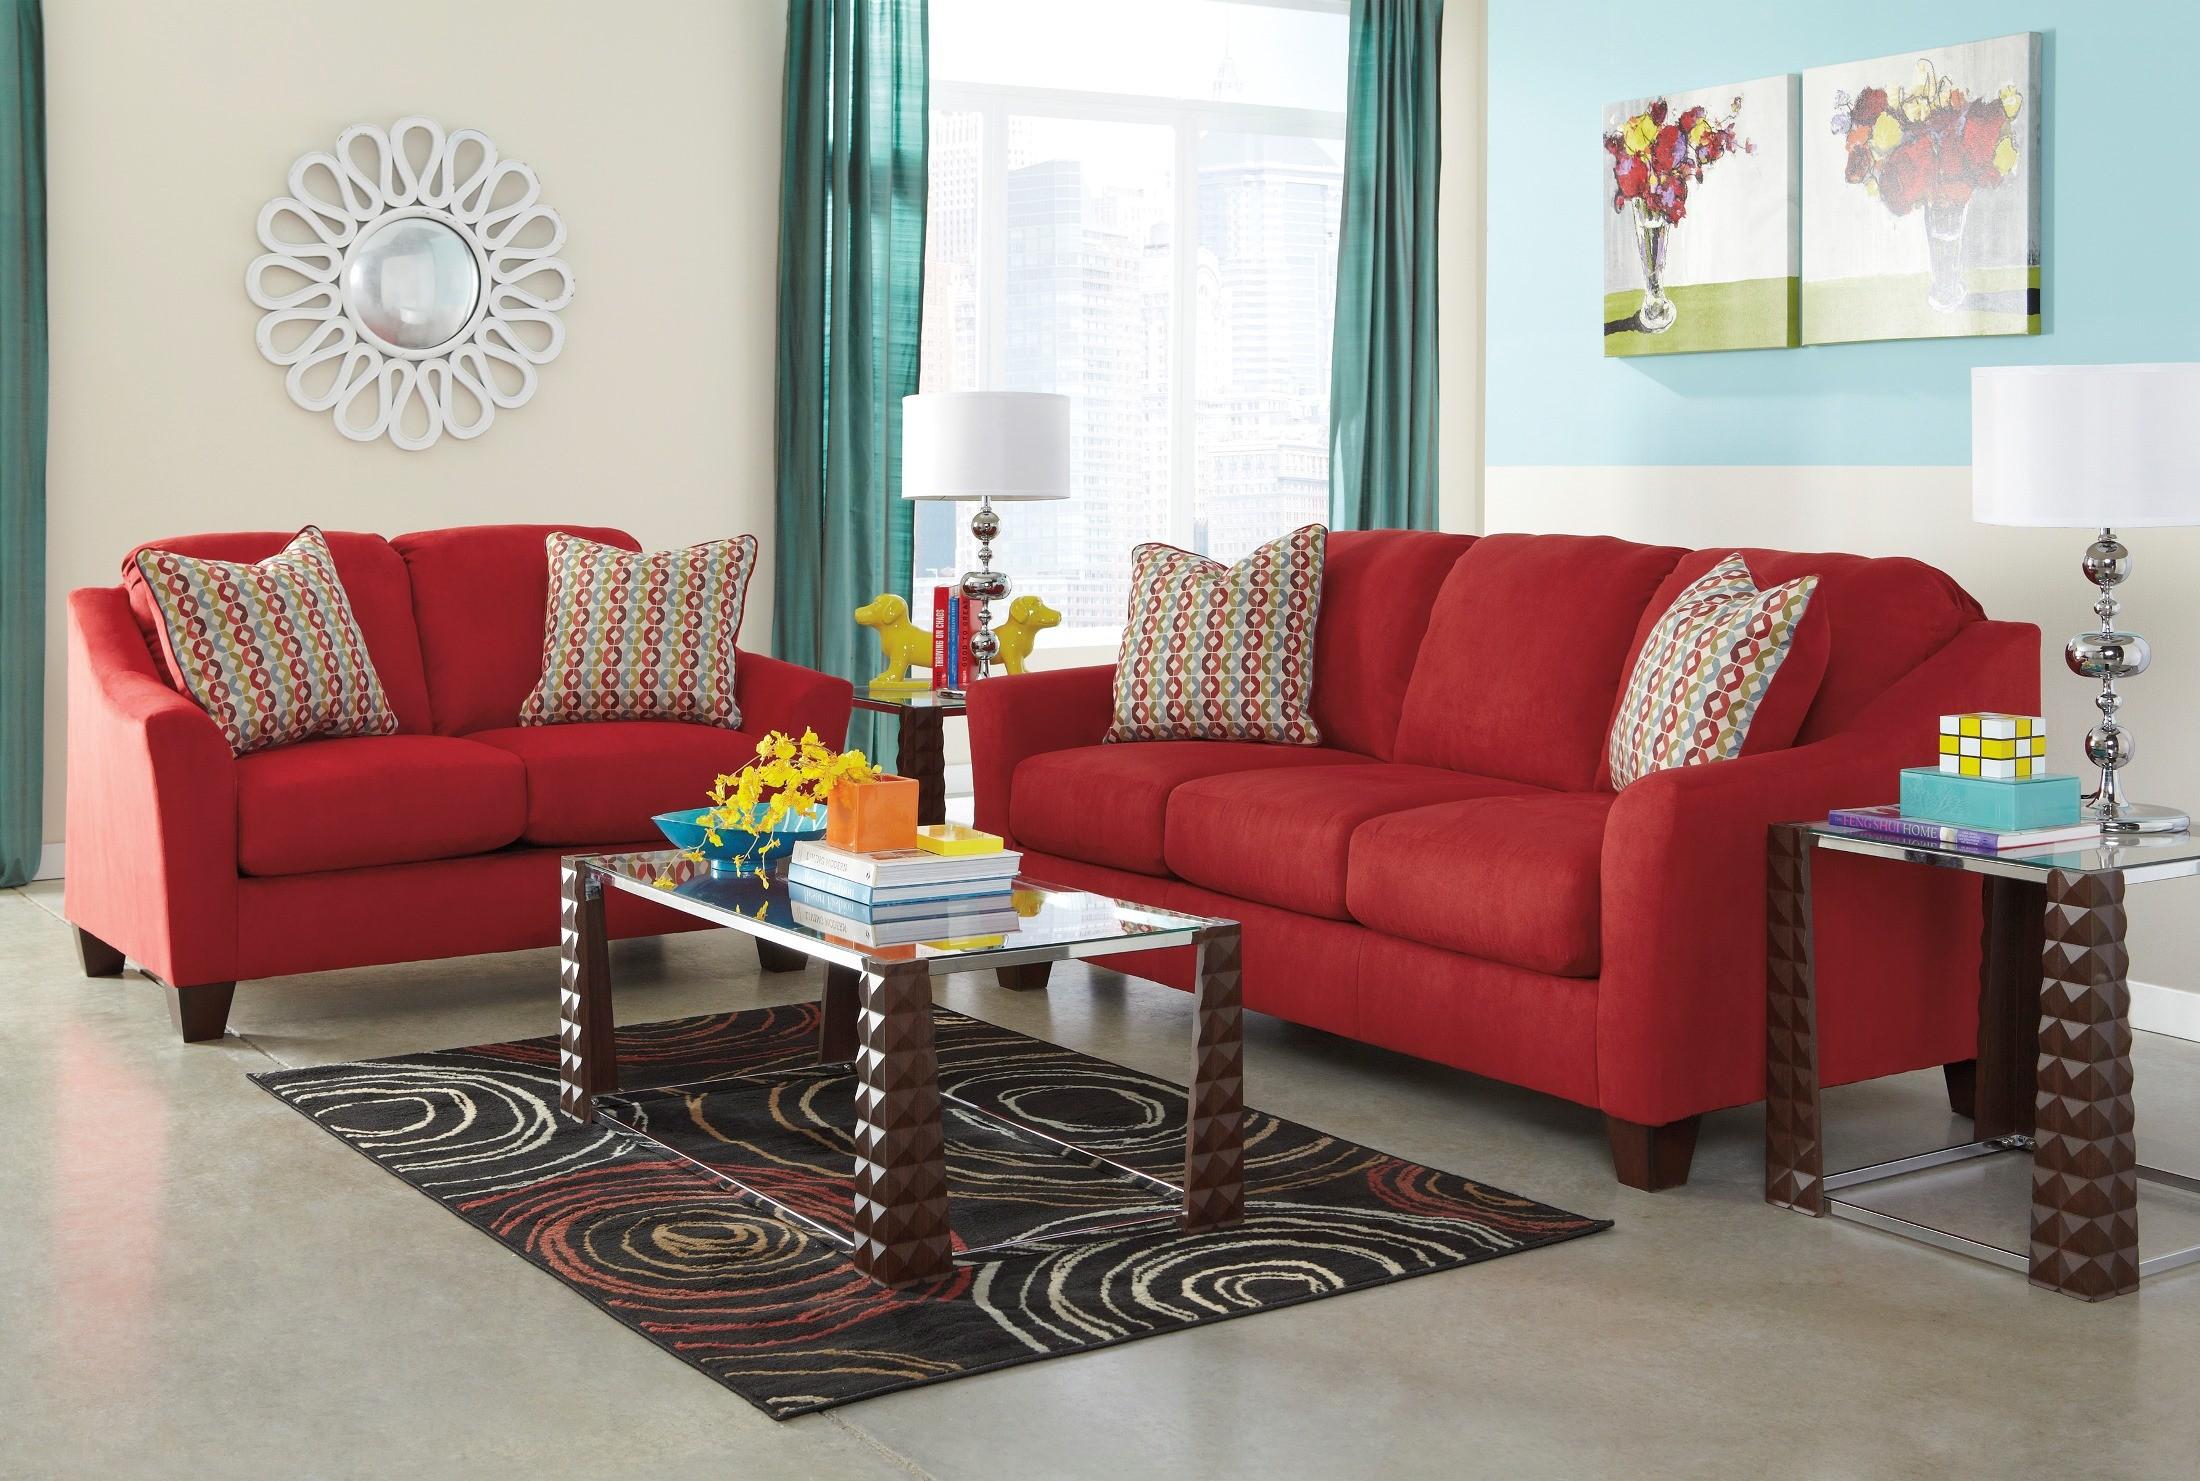 Hannin Spice Living Room Set From Ashley 95801 38 35